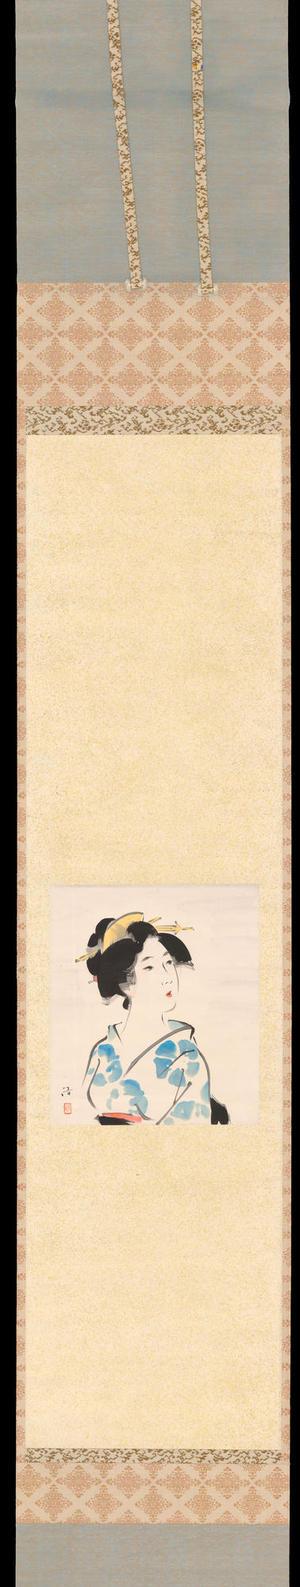 Asai Kiyoshi: Summer Evening - 夏の夕 - Ohmi Gallery